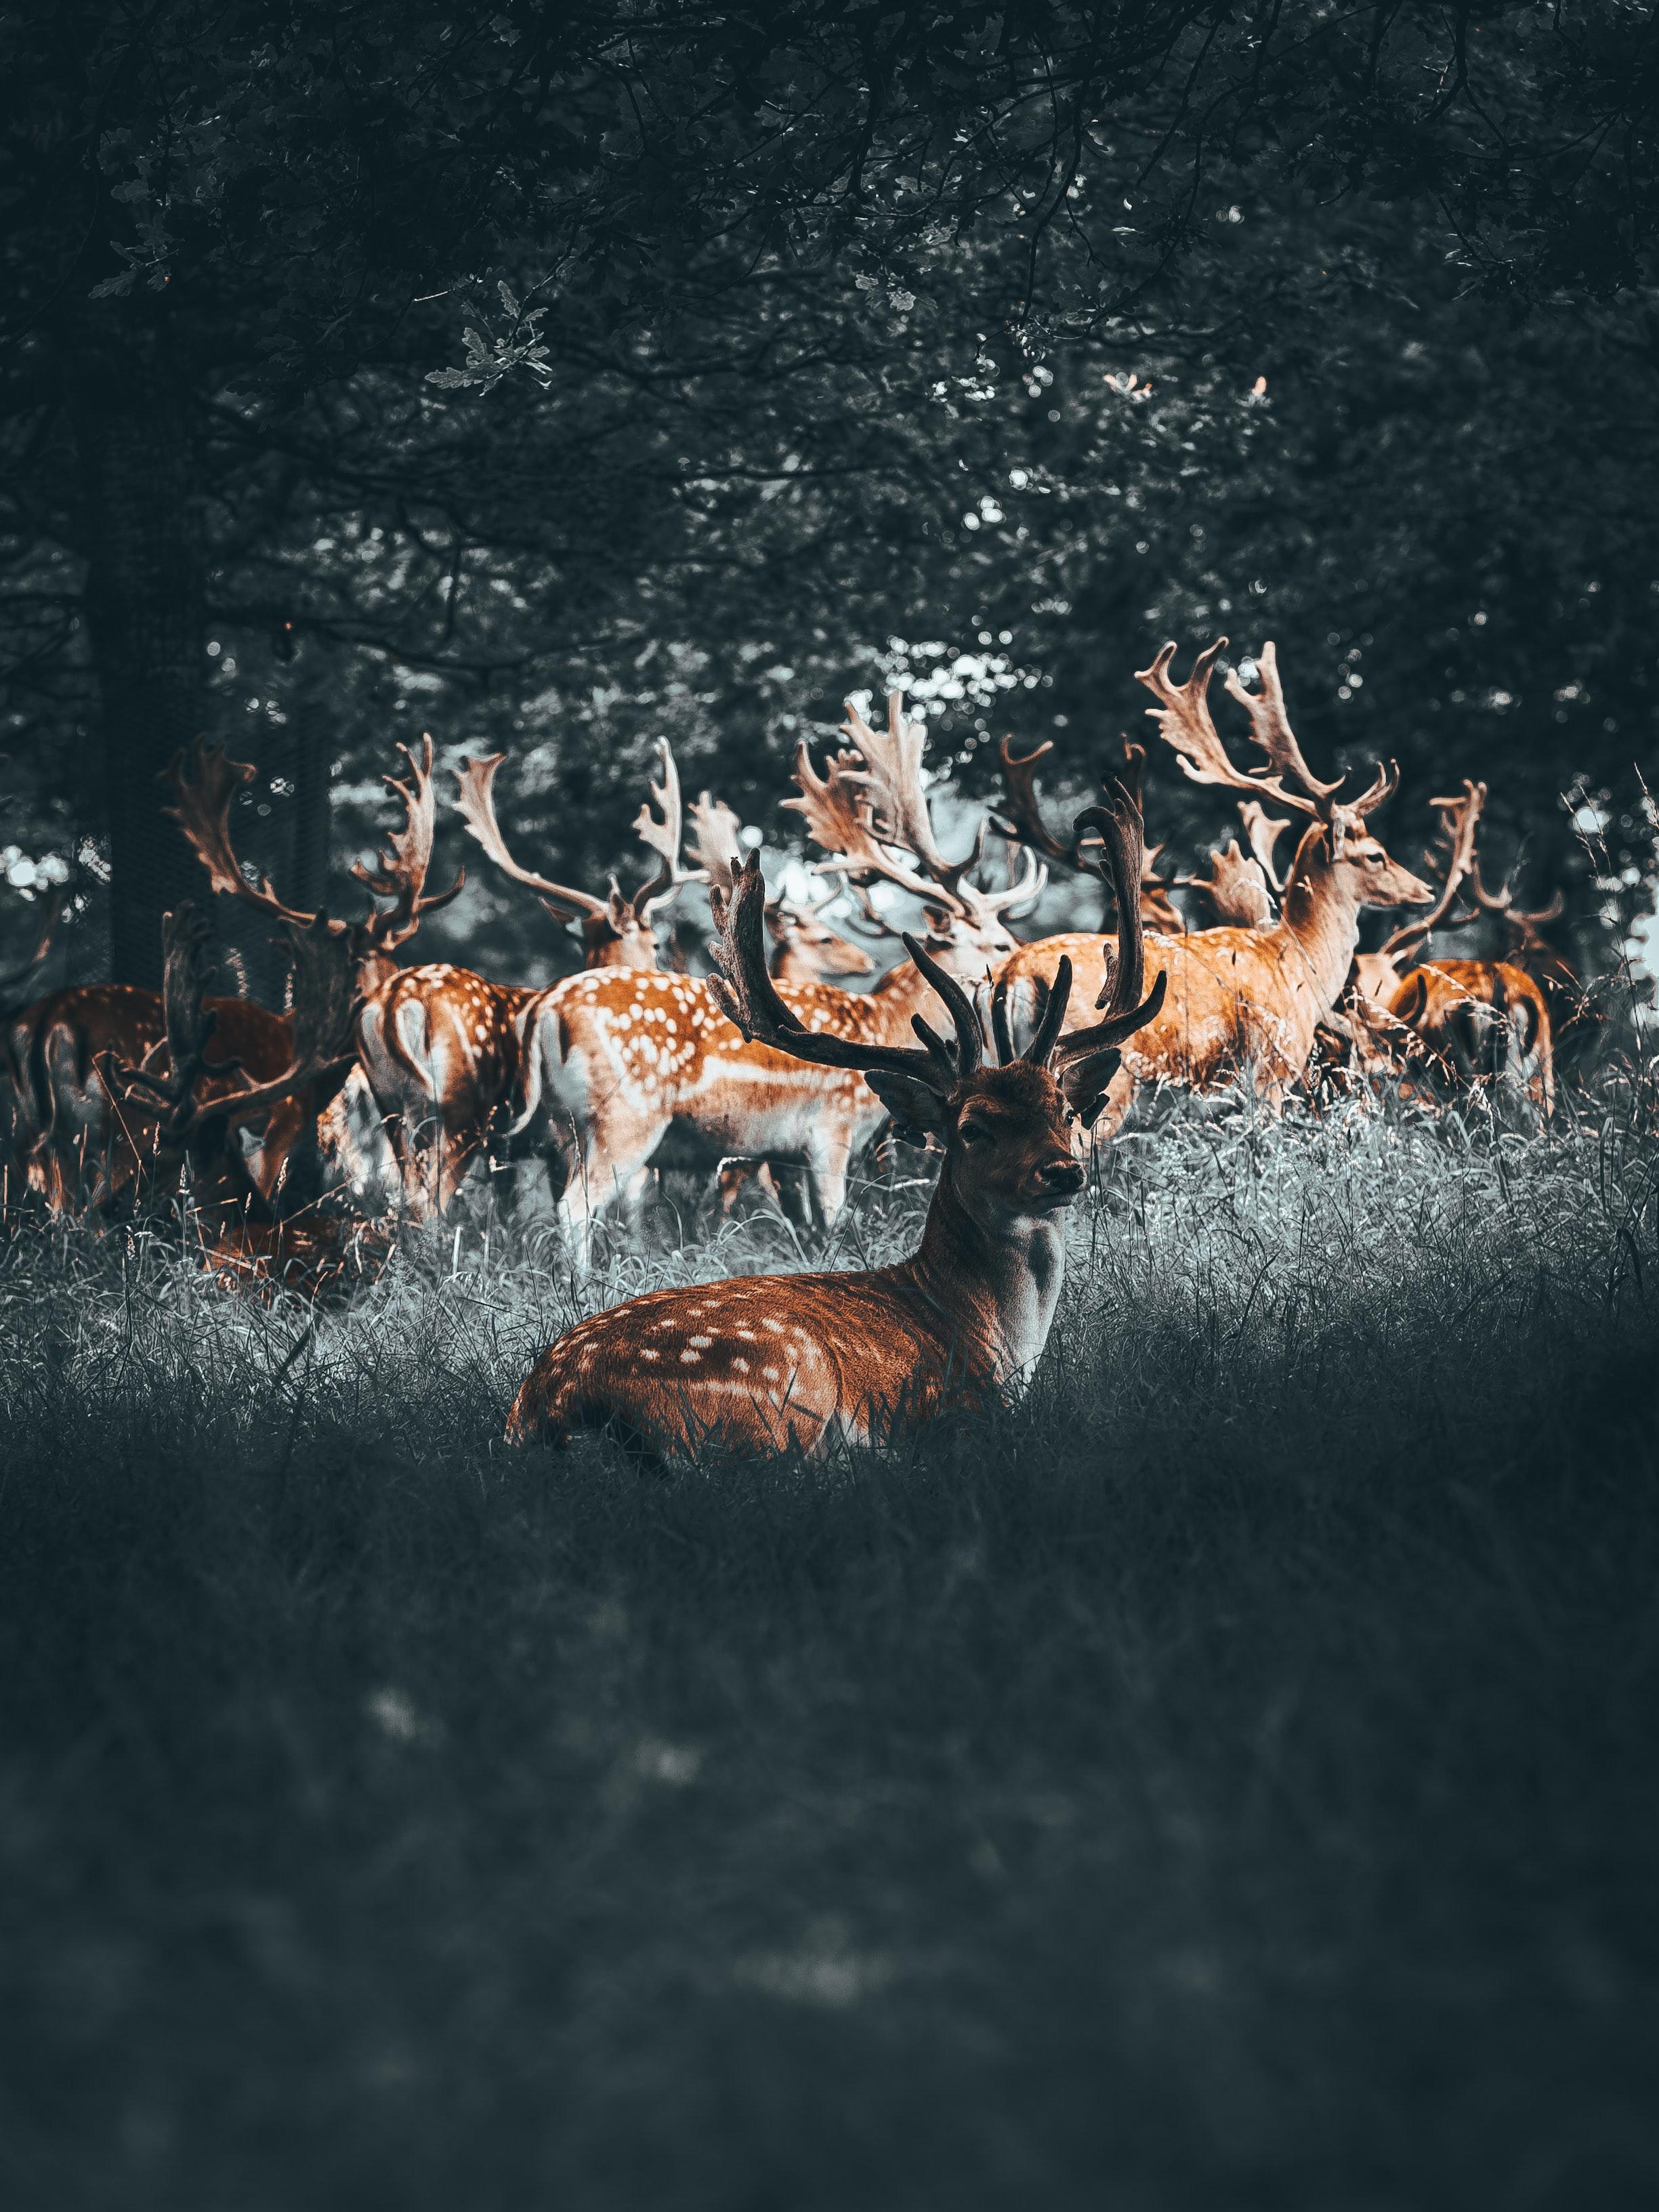 114372 download wallpaper Animals, Deers, Deer, Horns, Herd, Forest screensavers and pictures for free